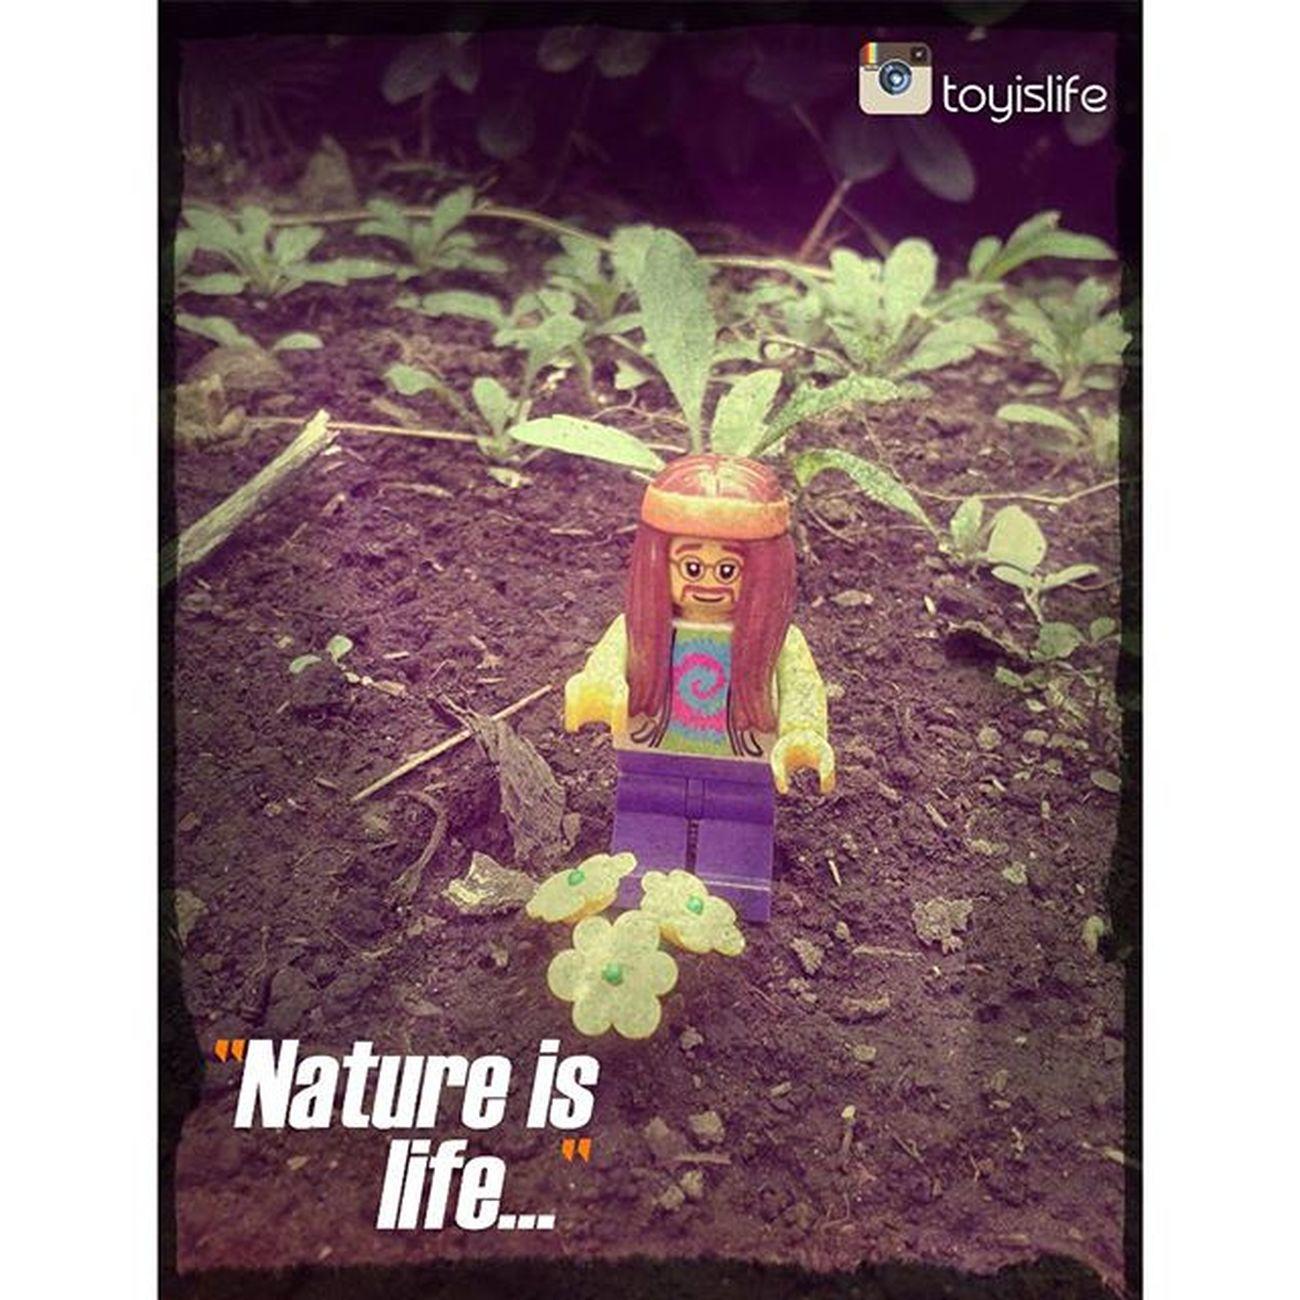 So peaceful... (re-release) LEGO Legophotography Toyography Toyfun Mondayfunday Groovy Peaceful Peace Peaceandlove Minifigaddiction Legoaddict Legominifigures Legominifigs Afol Vitruvianbrix Brickvision